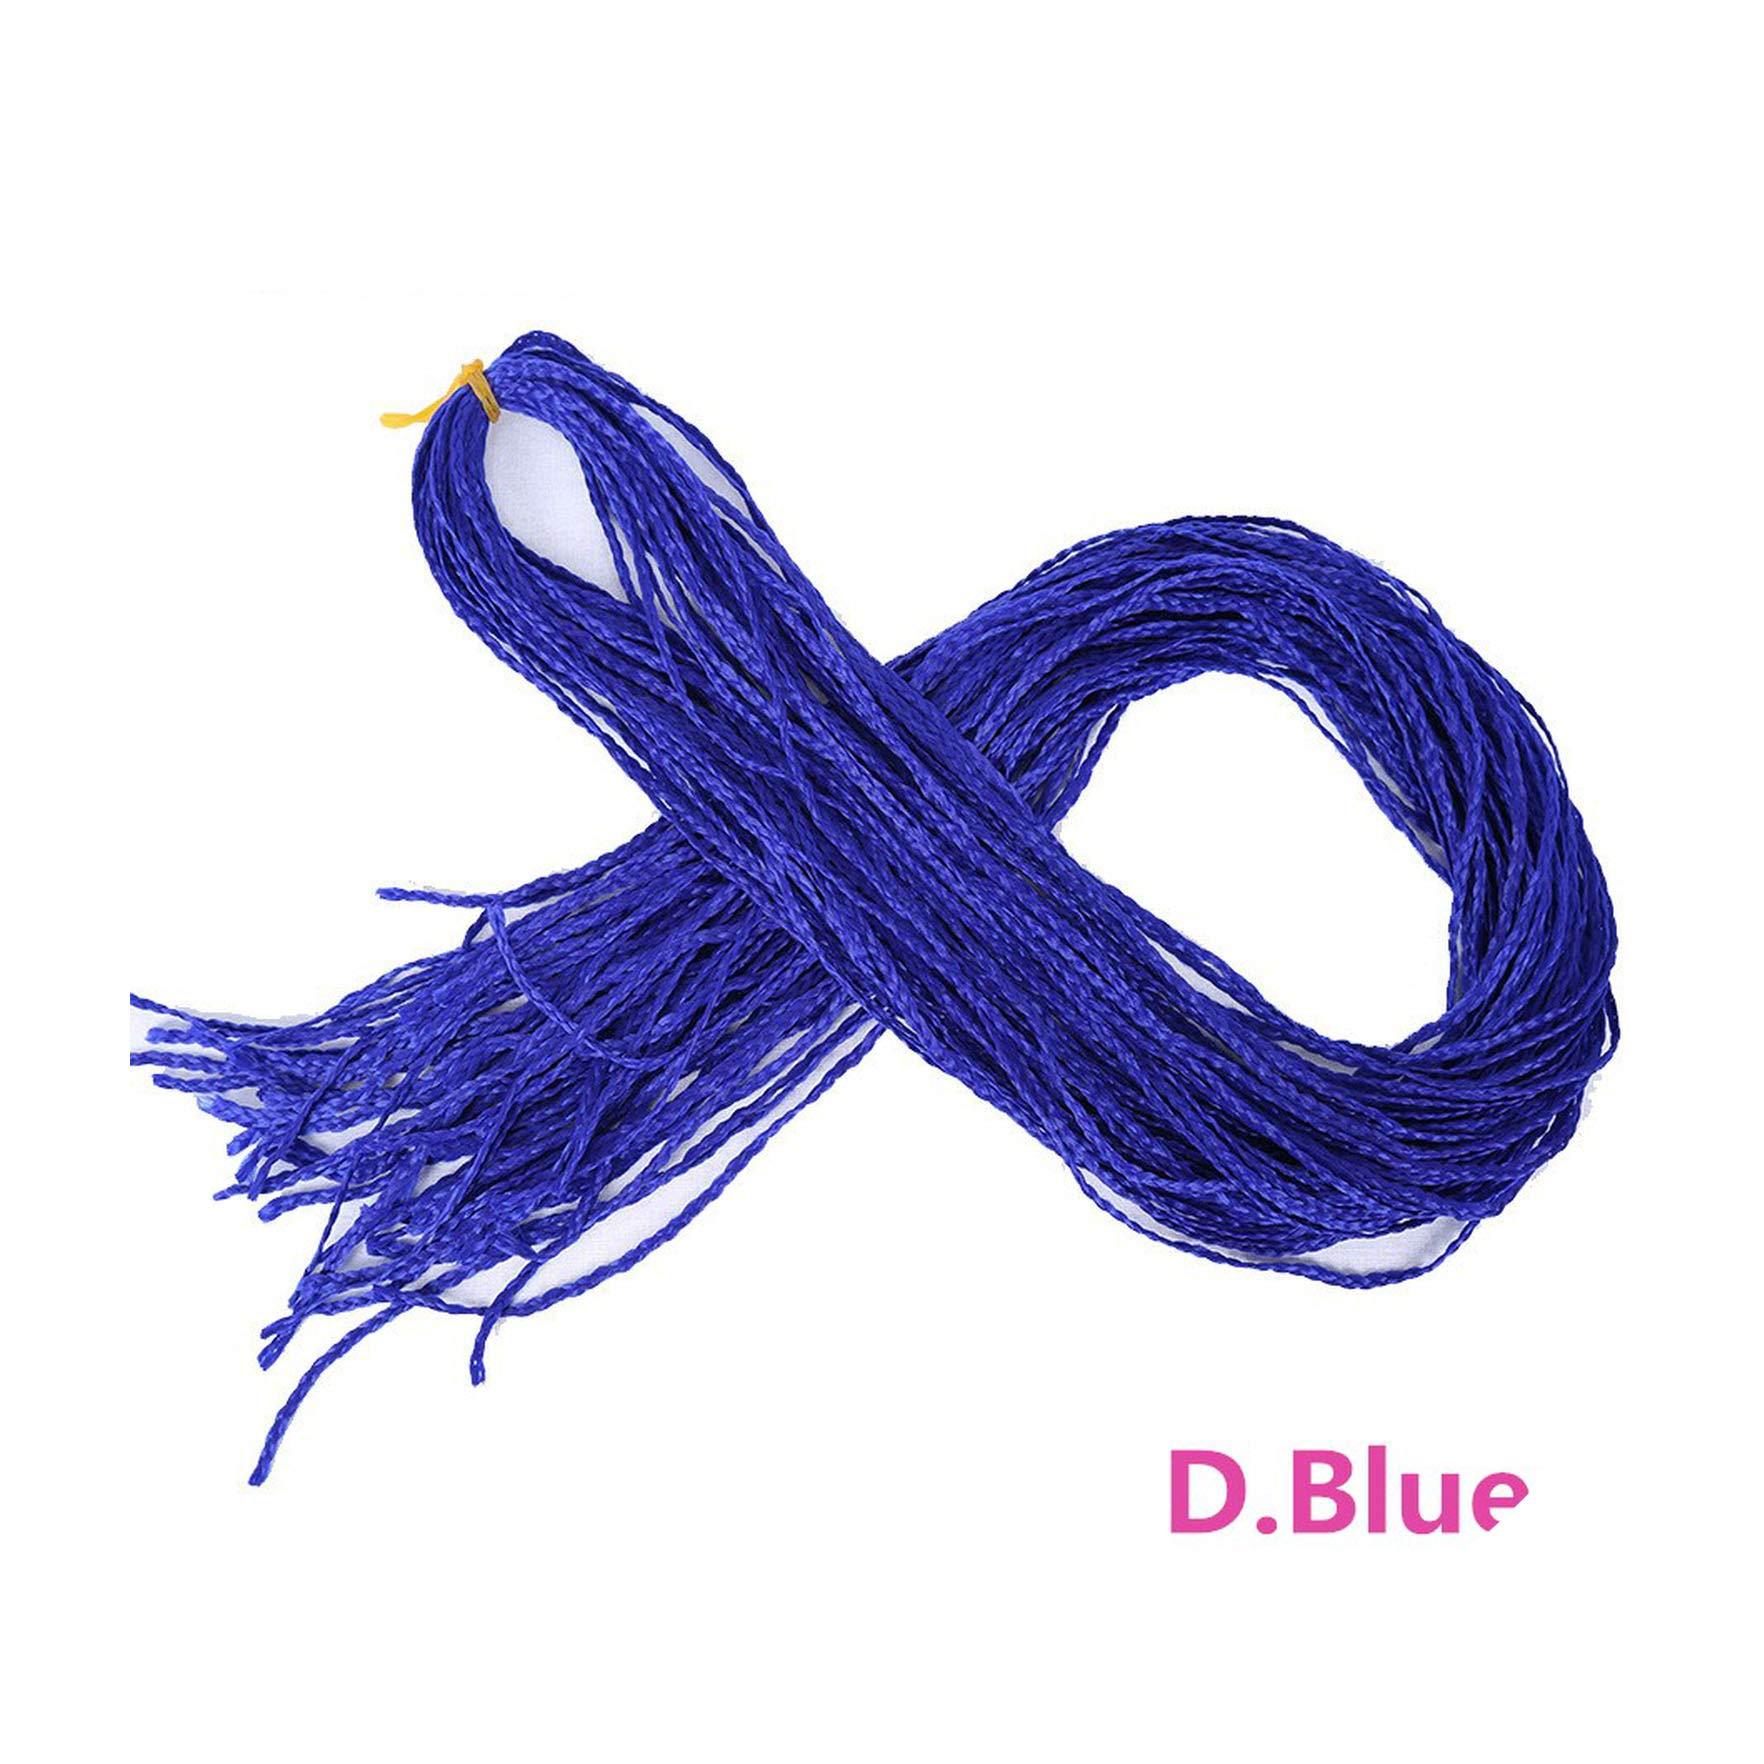 Chorliss 28'' Crochet Box Braids Zizi Braids Crochet Hair Bundles Synthetic Hair Extensions Braiding Hair Blonde Balck Grey Red,D.Blue,28Inches,6Pcs/Lot by Amazing21